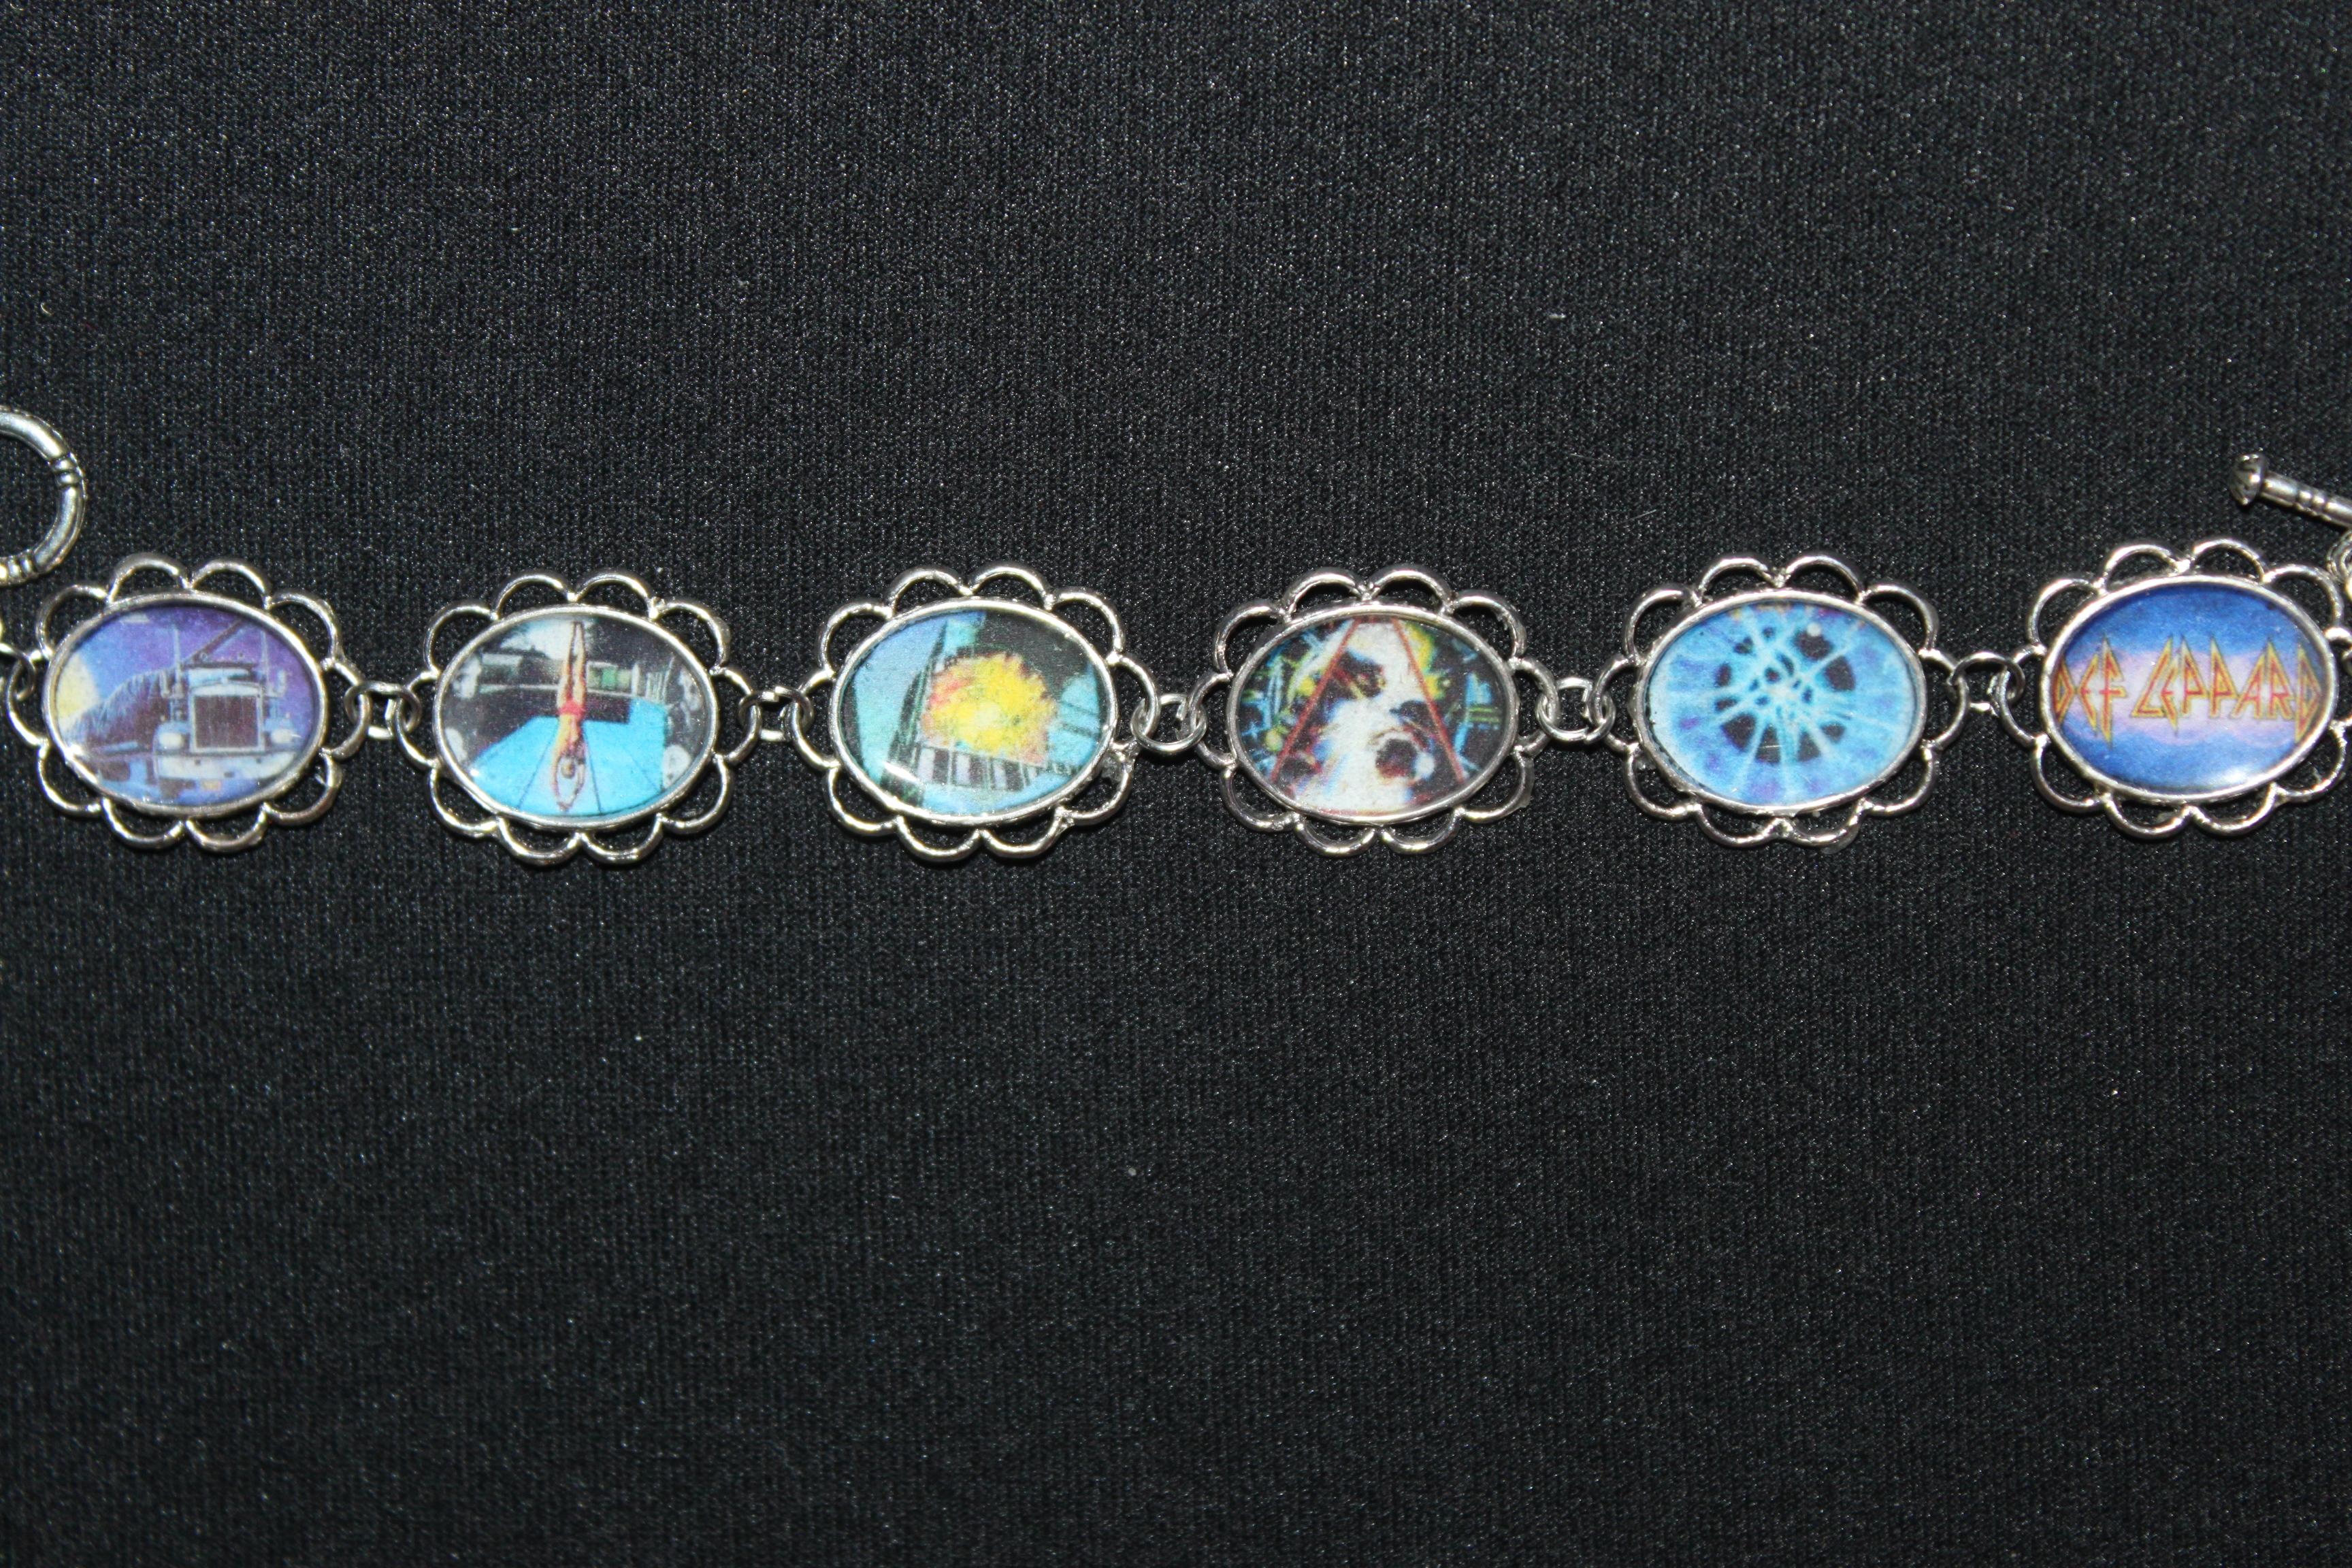 Def Leppard album cover art bracelet